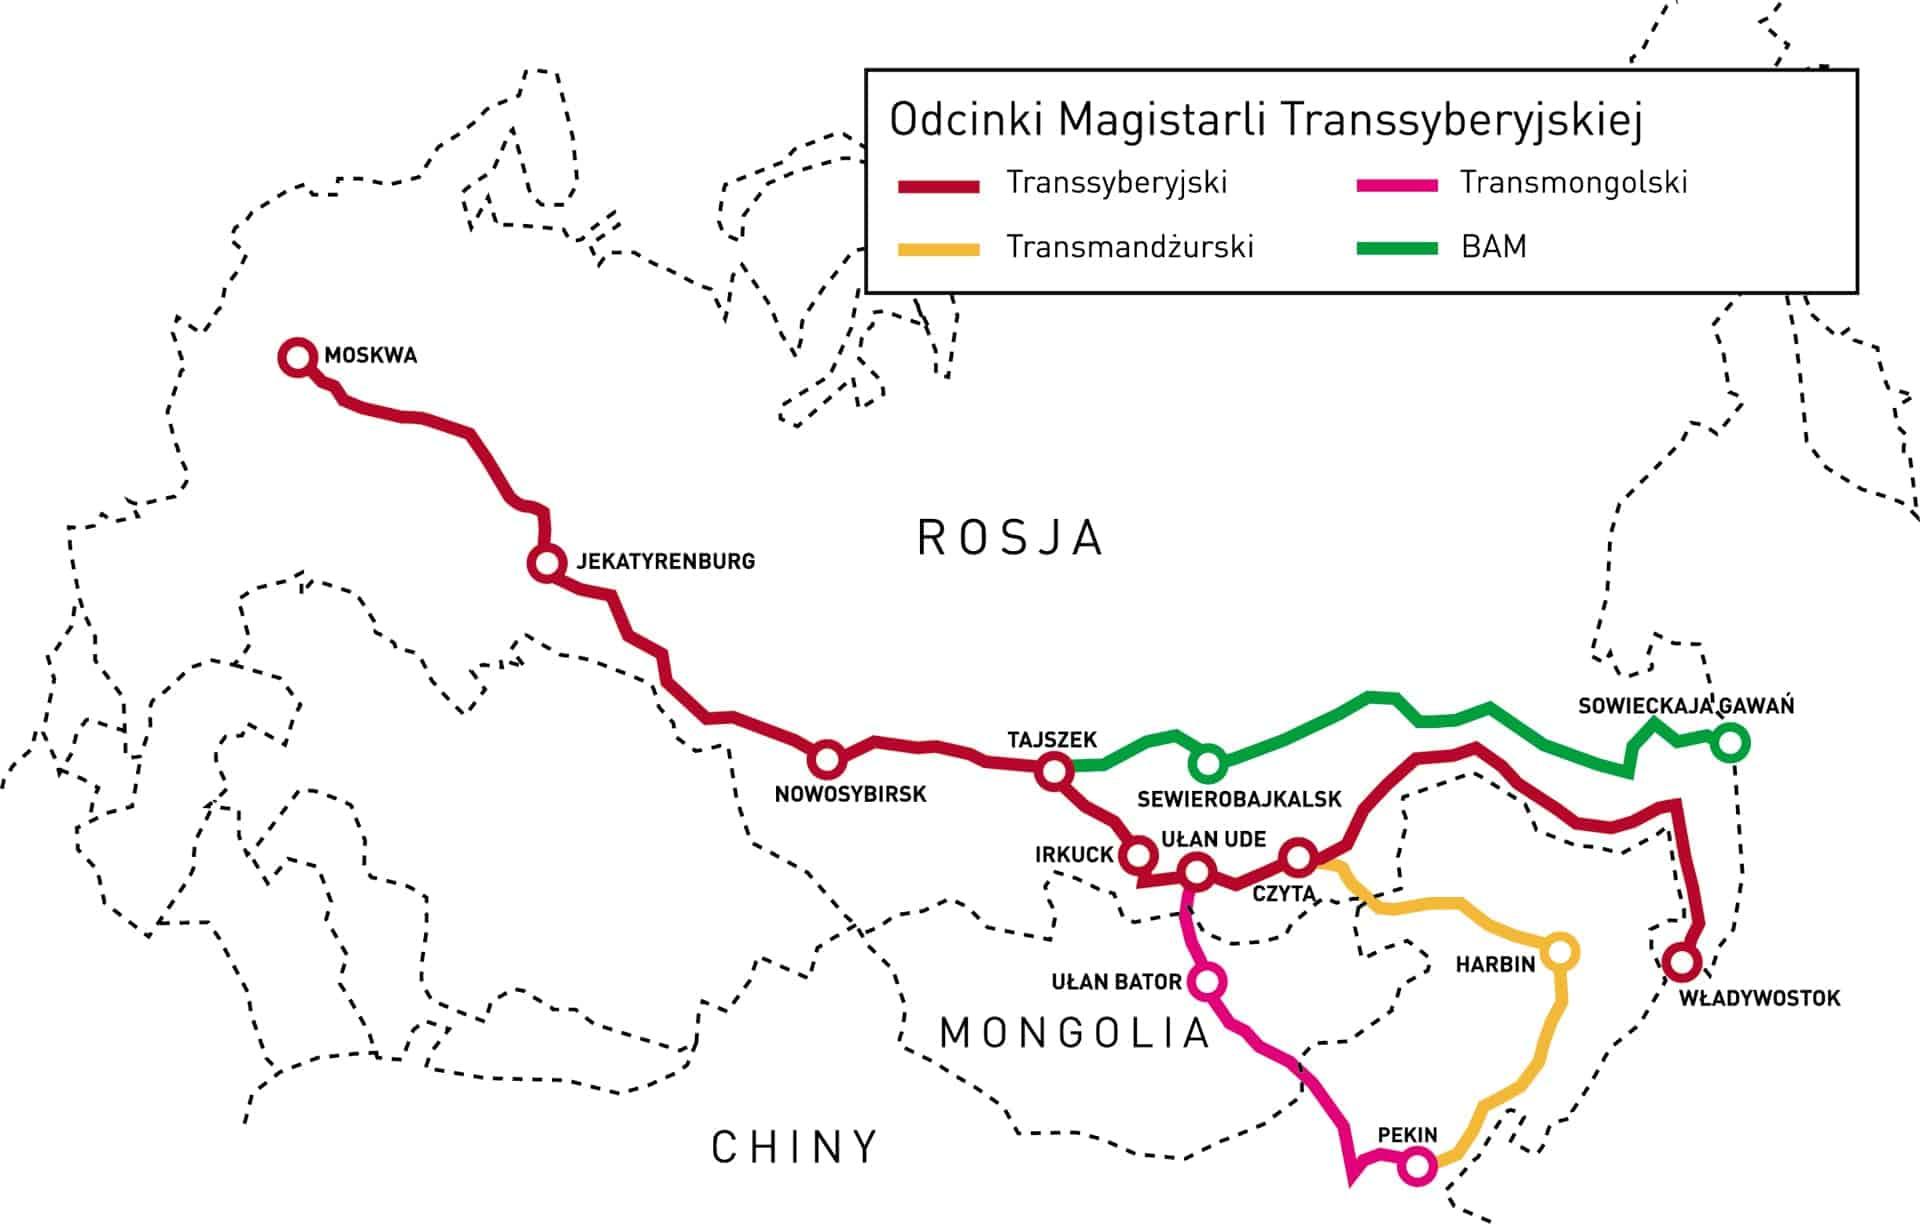 mapa-magistrali-transsyberyjskiej-transsyberysjka-pl